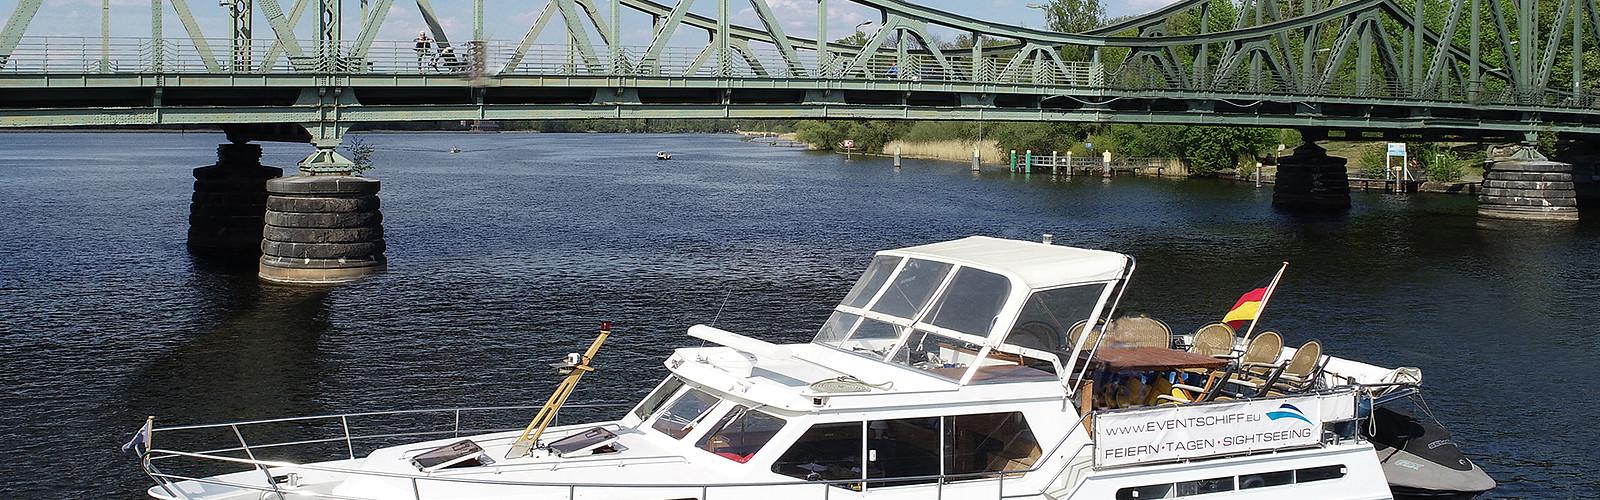 Glienicker Brücke (c) AHOI Yachting Winkler 2019, Foto: Günther Winkler, Lizenz: Günther Winkler